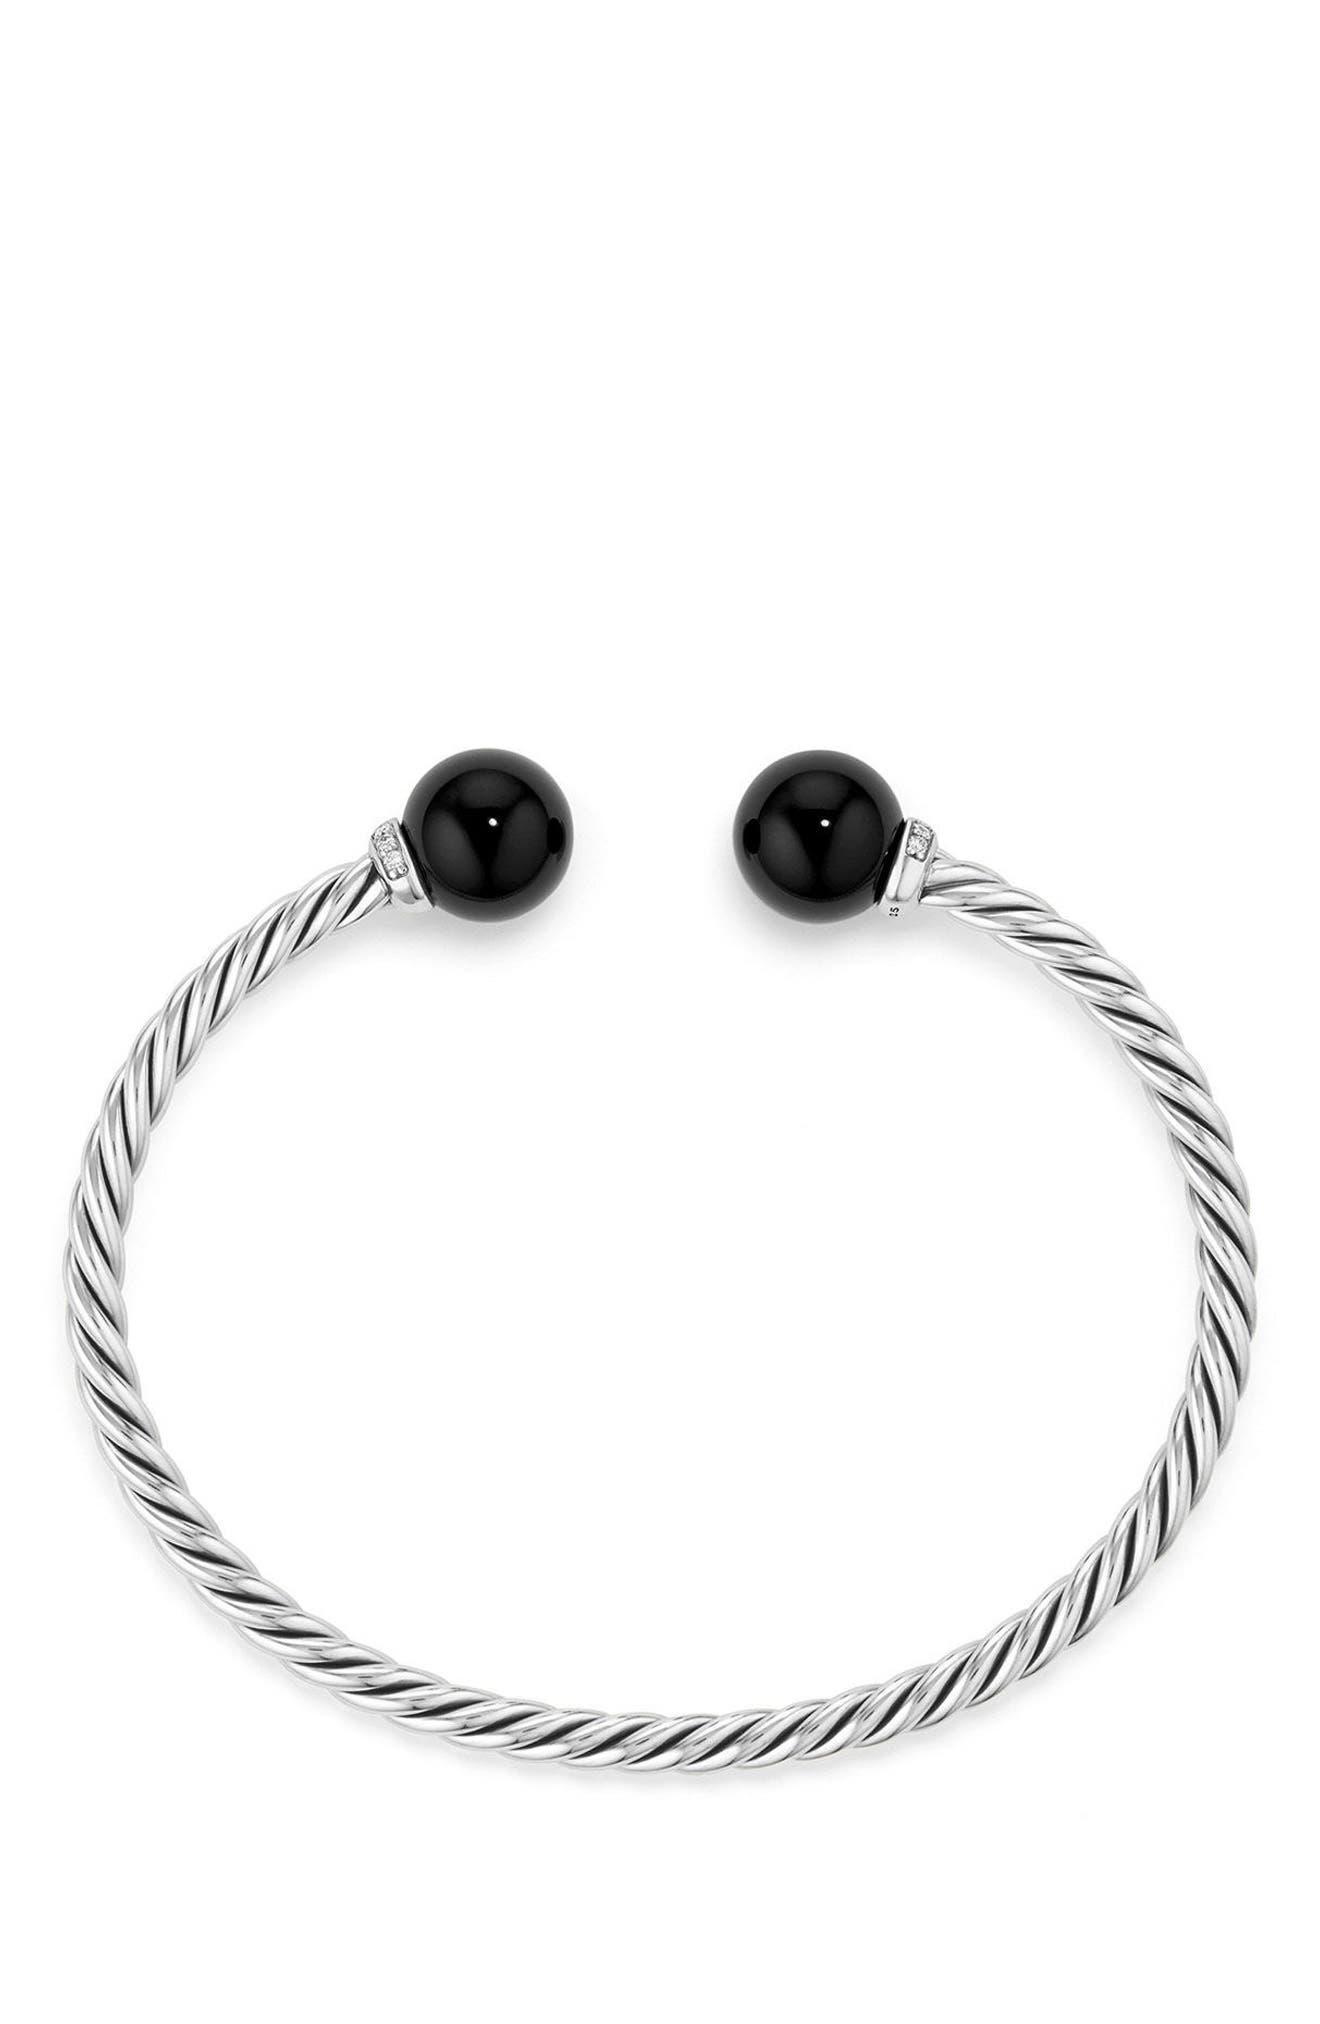 Solari Bead Bracelet with Diamonds,                             Alternate thumbnail 2, color,                             SILVER/ DIAMOND/ BLACK ONYX